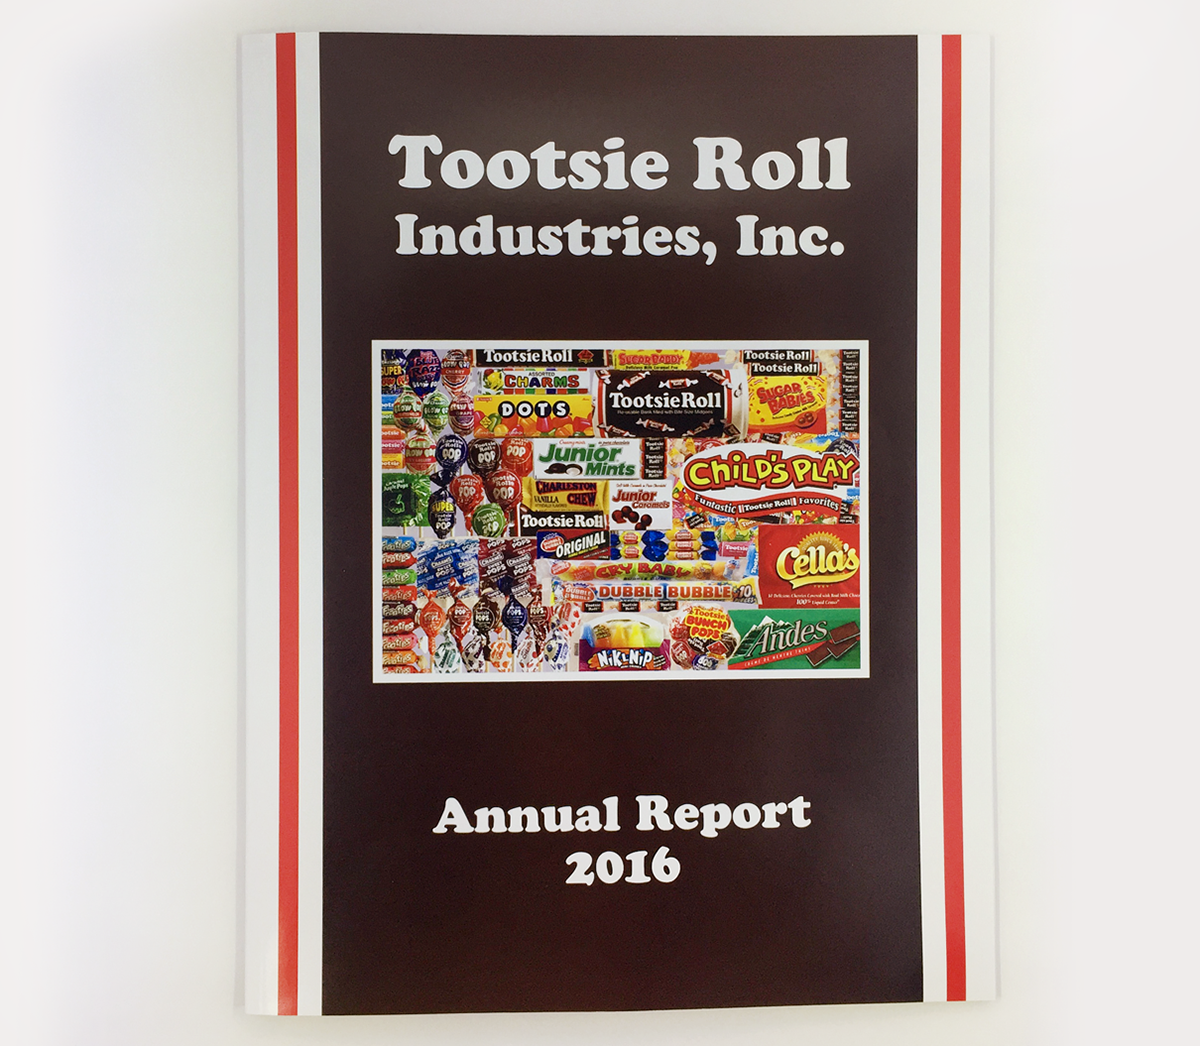 tootsie roll financial